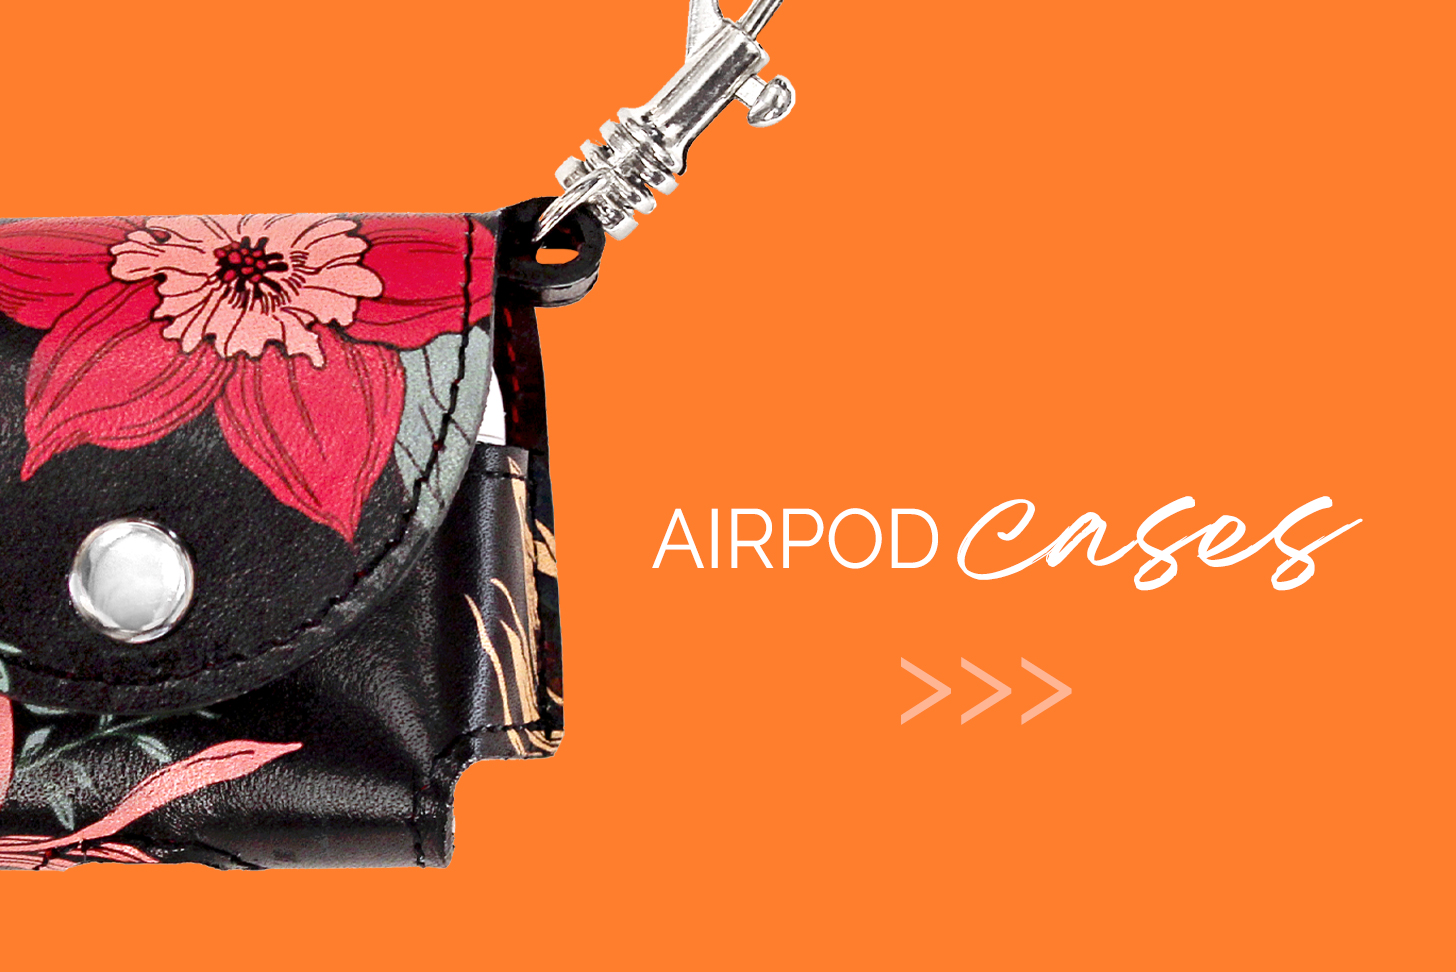 Airpod Case with Orange background